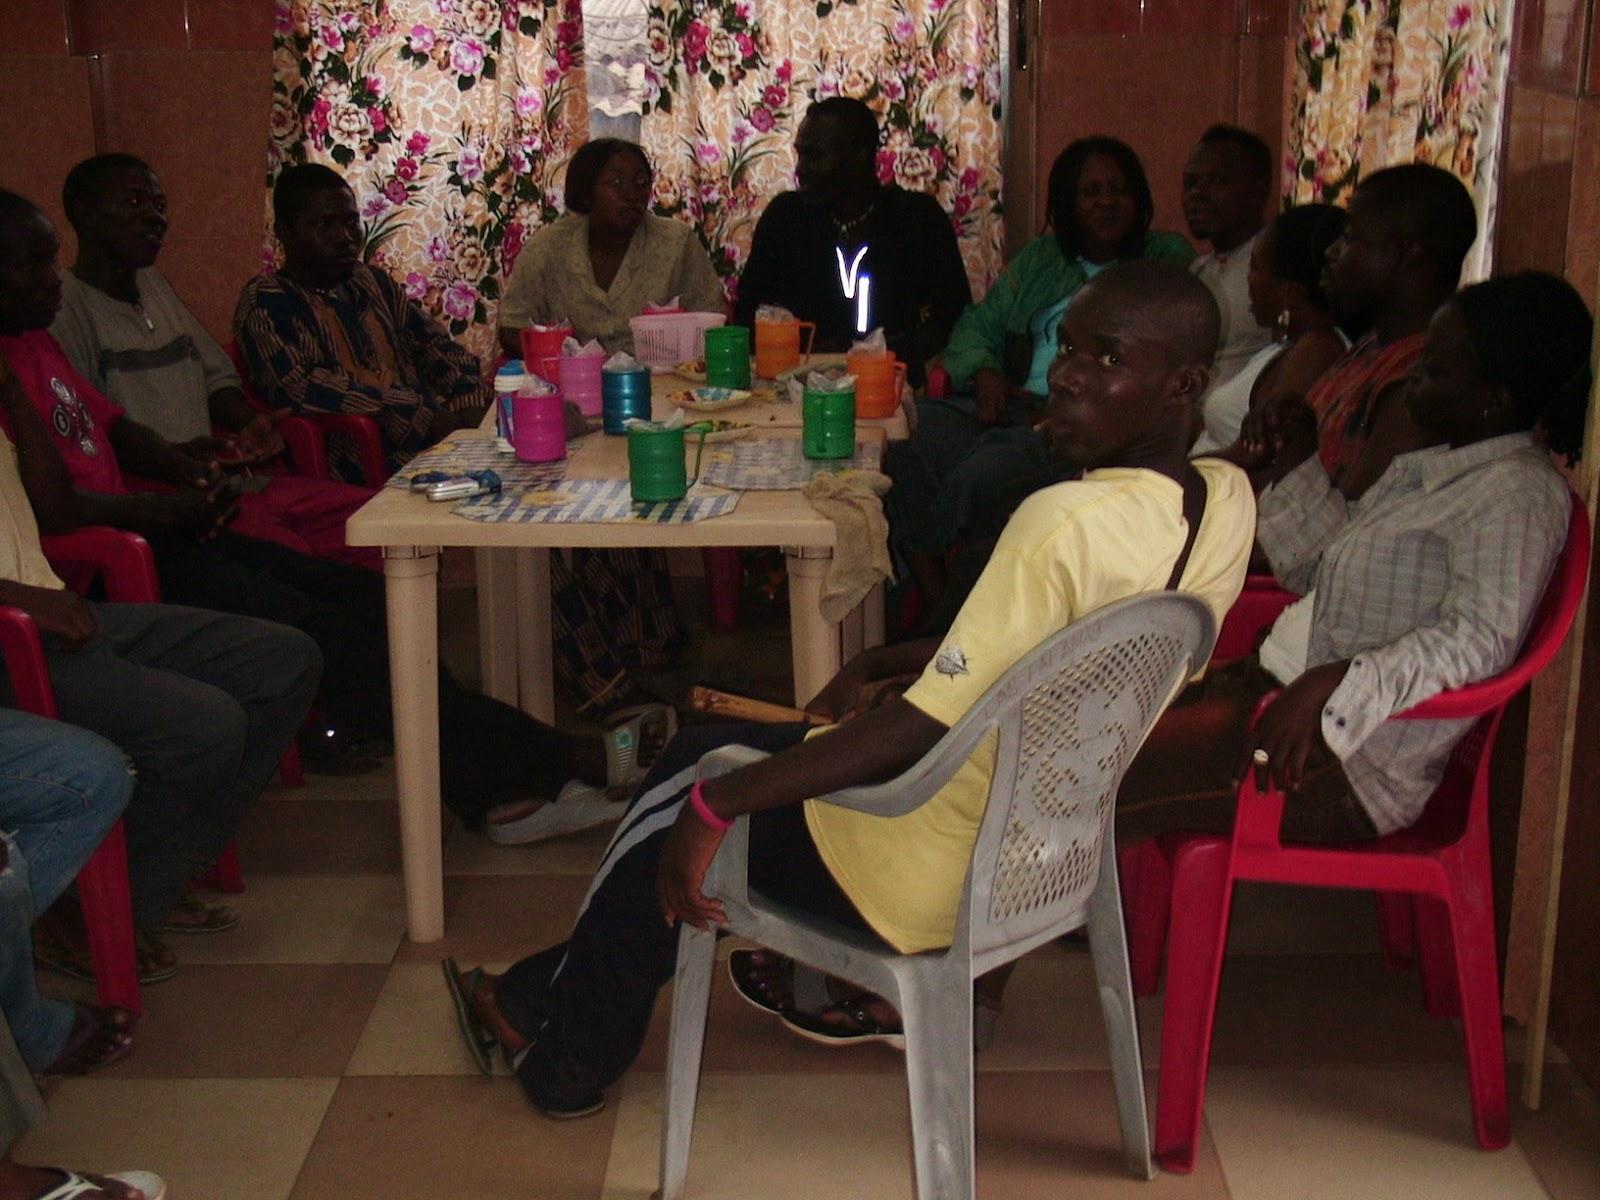 Rencontre Femme Célibataire Ghana - Accra, Greater Accra Region - mia67 - pharmacie-montblanc-chamonix.fr